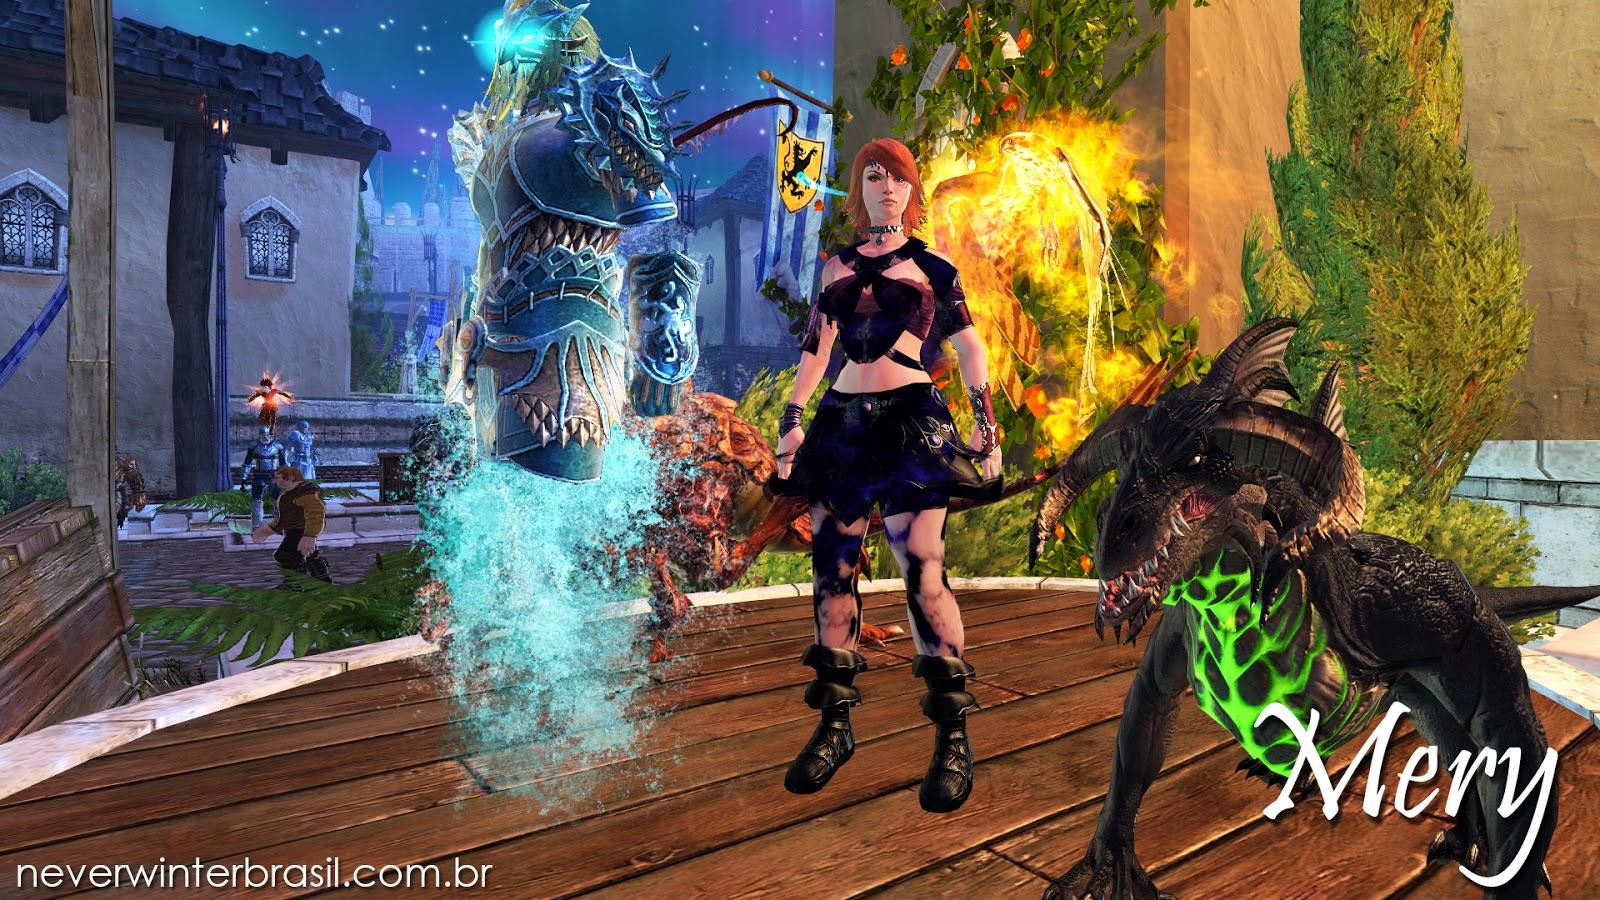 Mery - Member guild NeverwinterBrasil